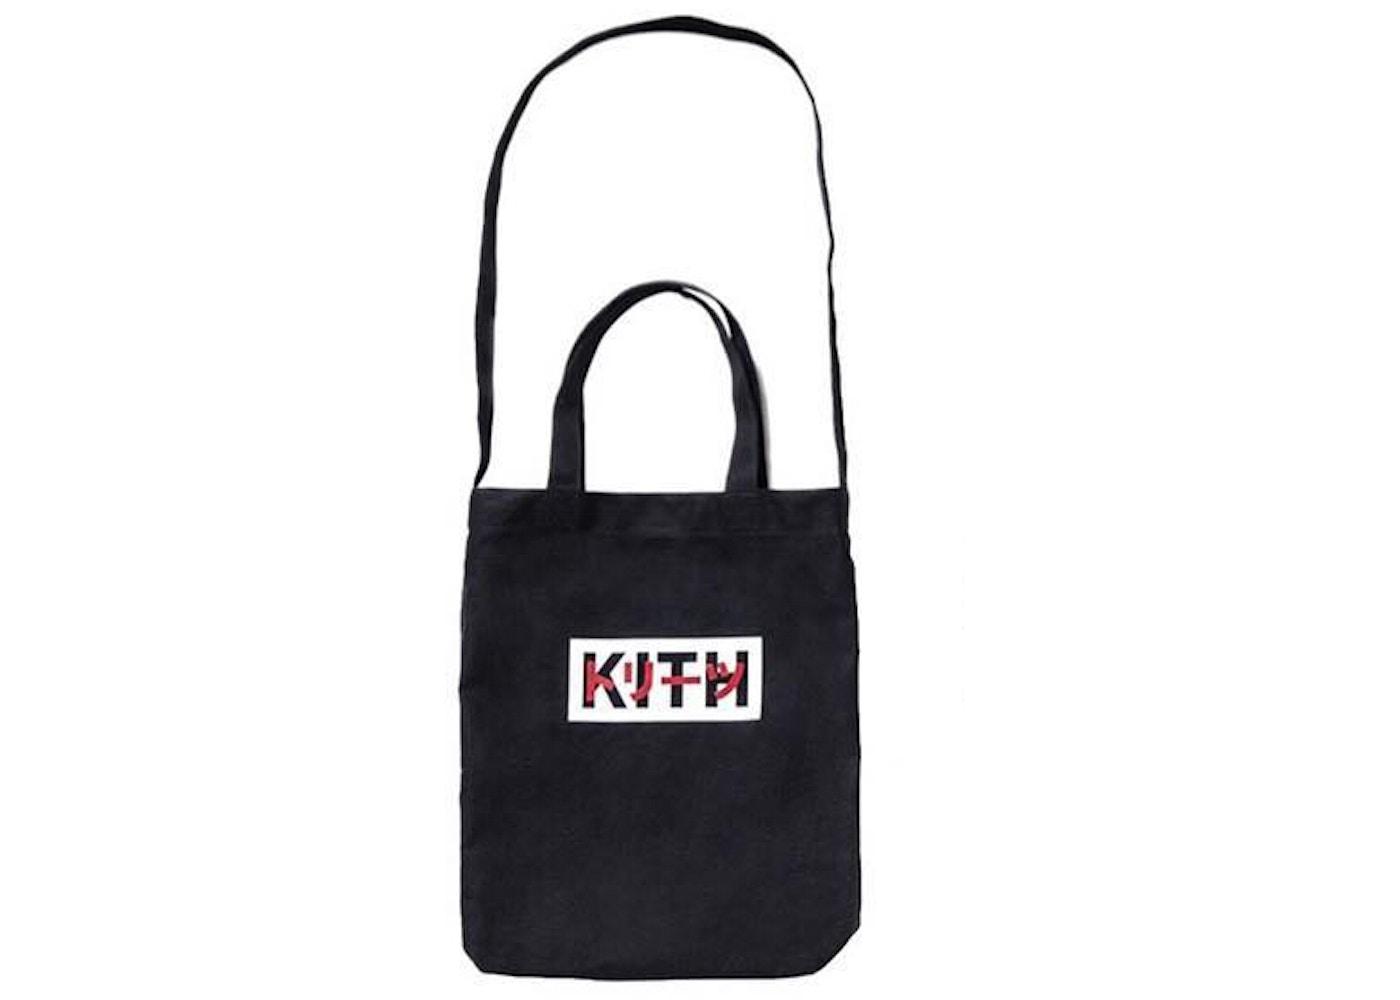 e057dc5b Streetwear - Kith Tops/Sweatshirts - New Highest Bids